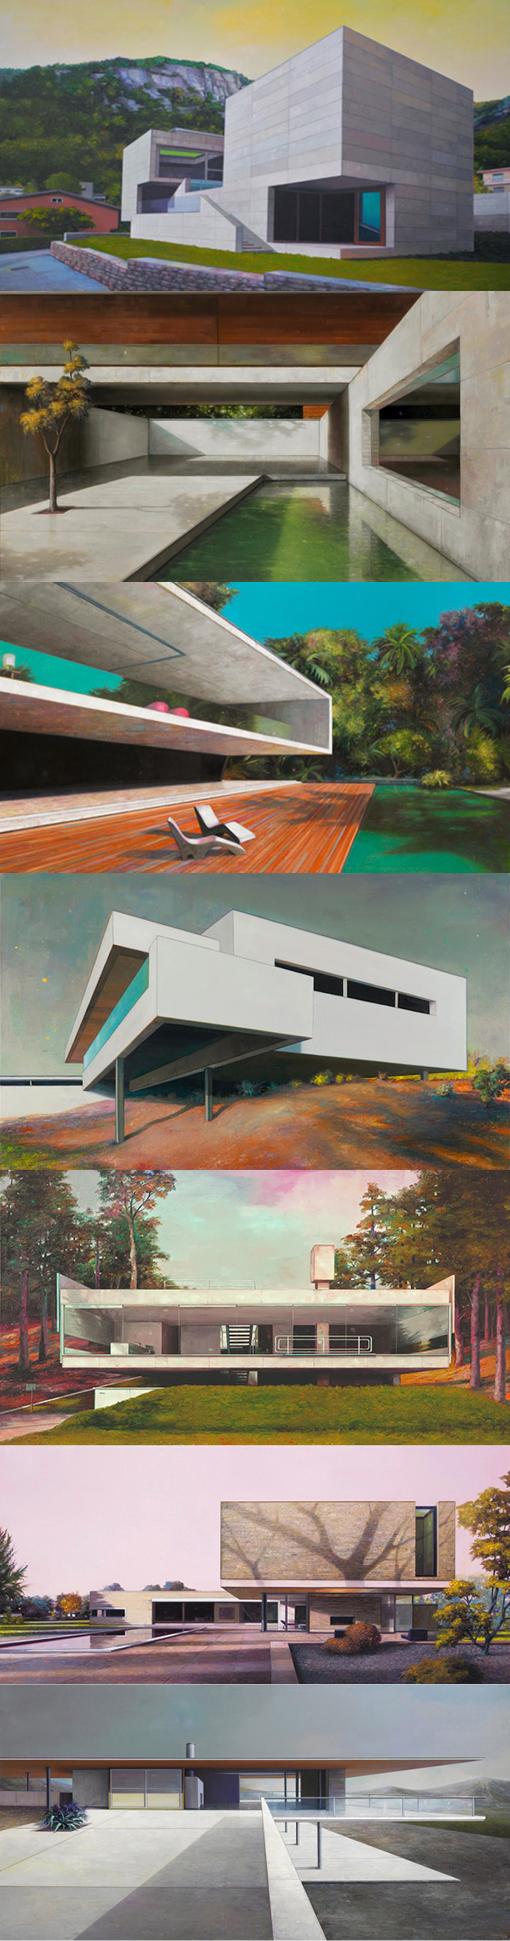 2012 jens hausmann modern house germany